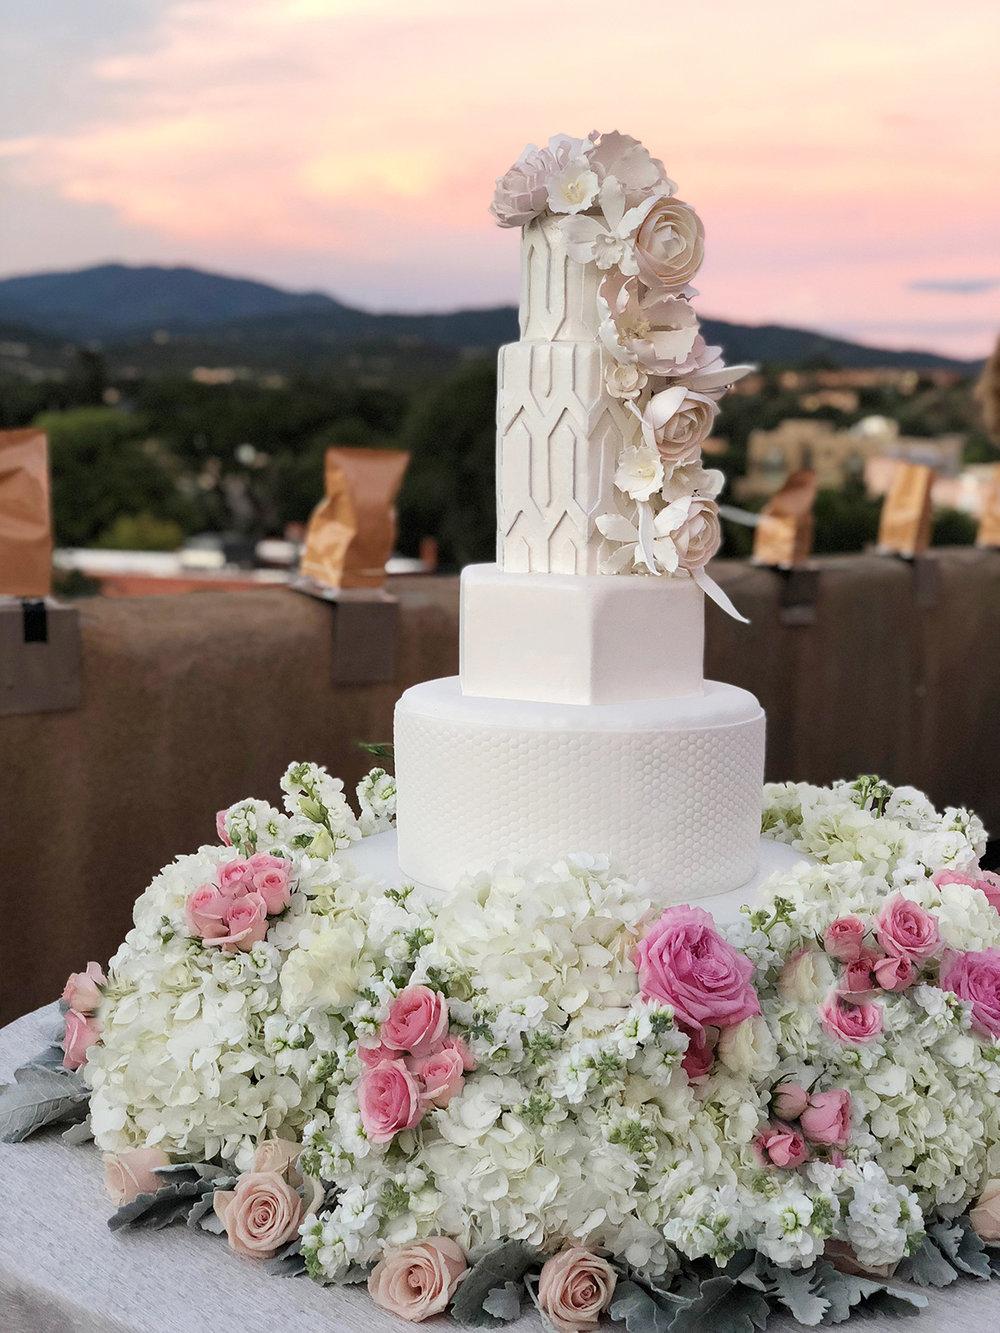 Wedding Cake2a.JPG